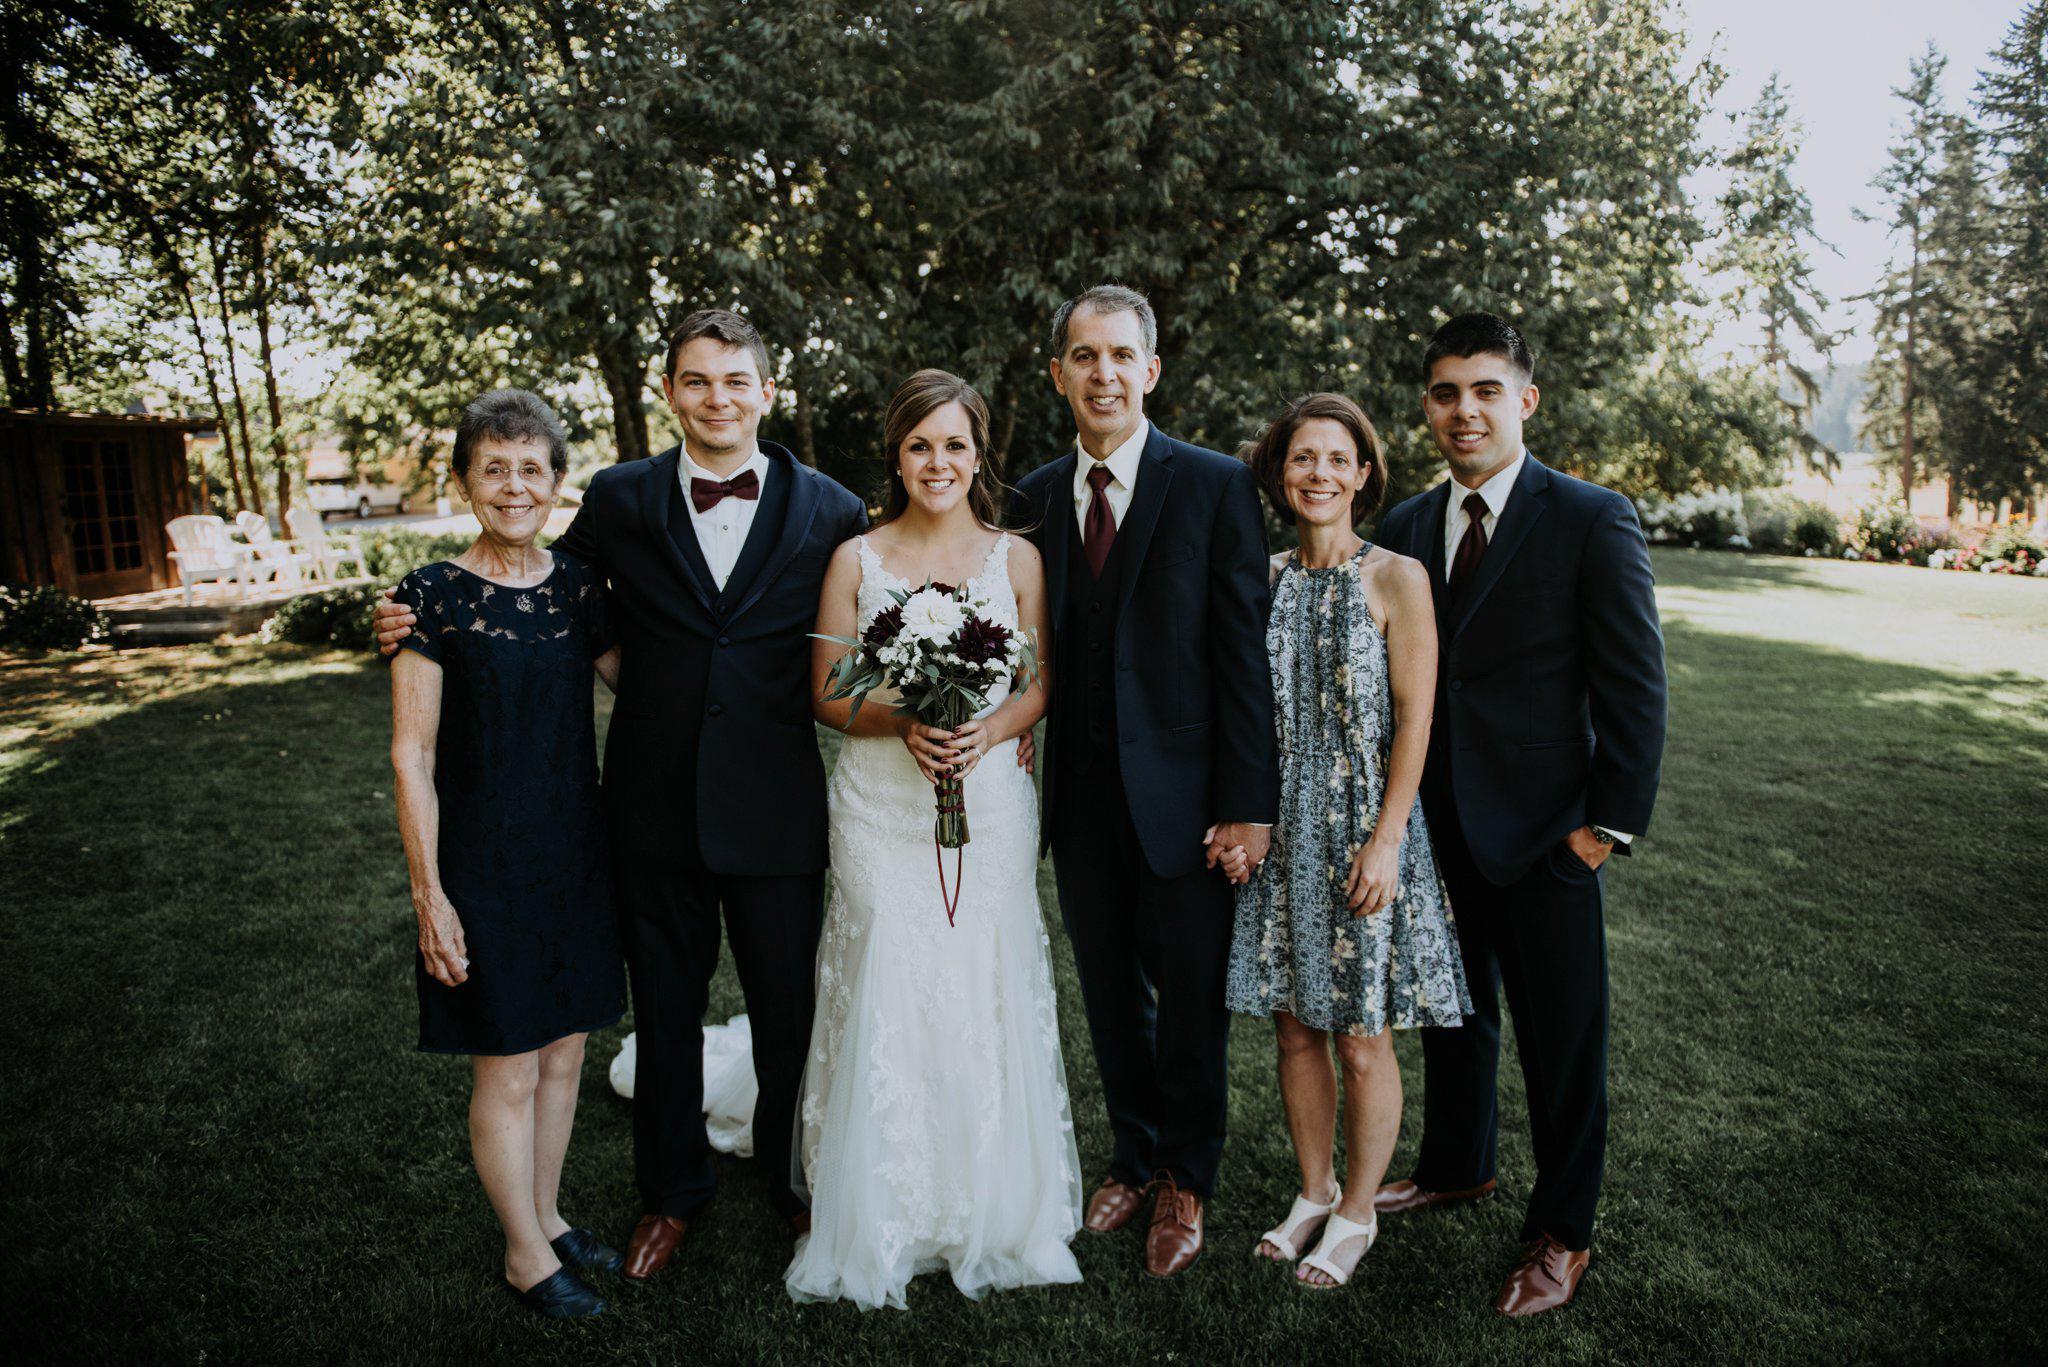 kristen-and-cody-the-kelley-farm-wedding-seattle-photographer-caitlyn-nikula-67.jpg